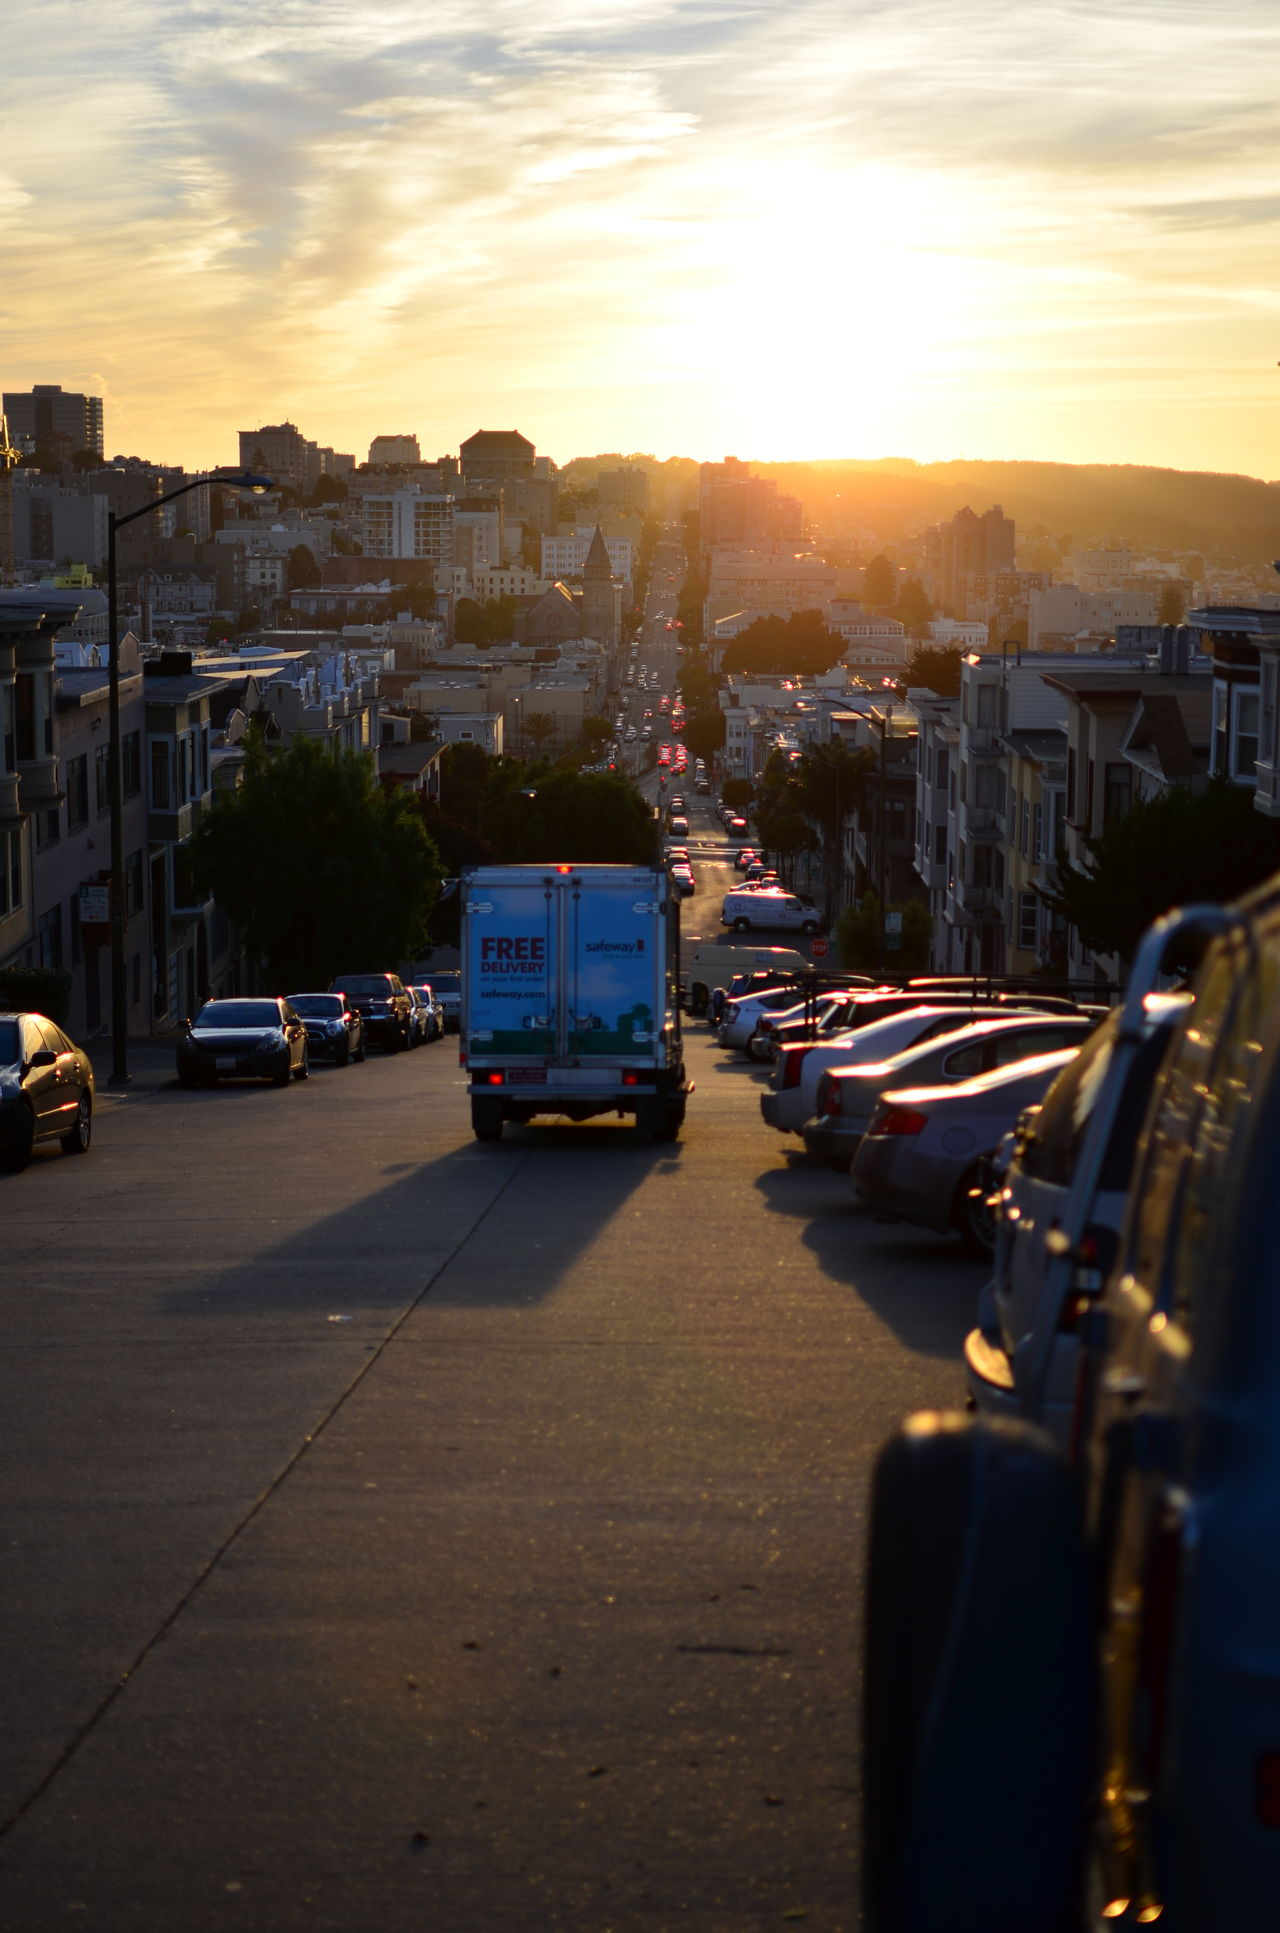 Lucky shot California Car City Cityscape Cloud - Sky D7000 DSLR Nikon No People Road Sky Sonnenuntergang Street Sun Sunlight Sunset